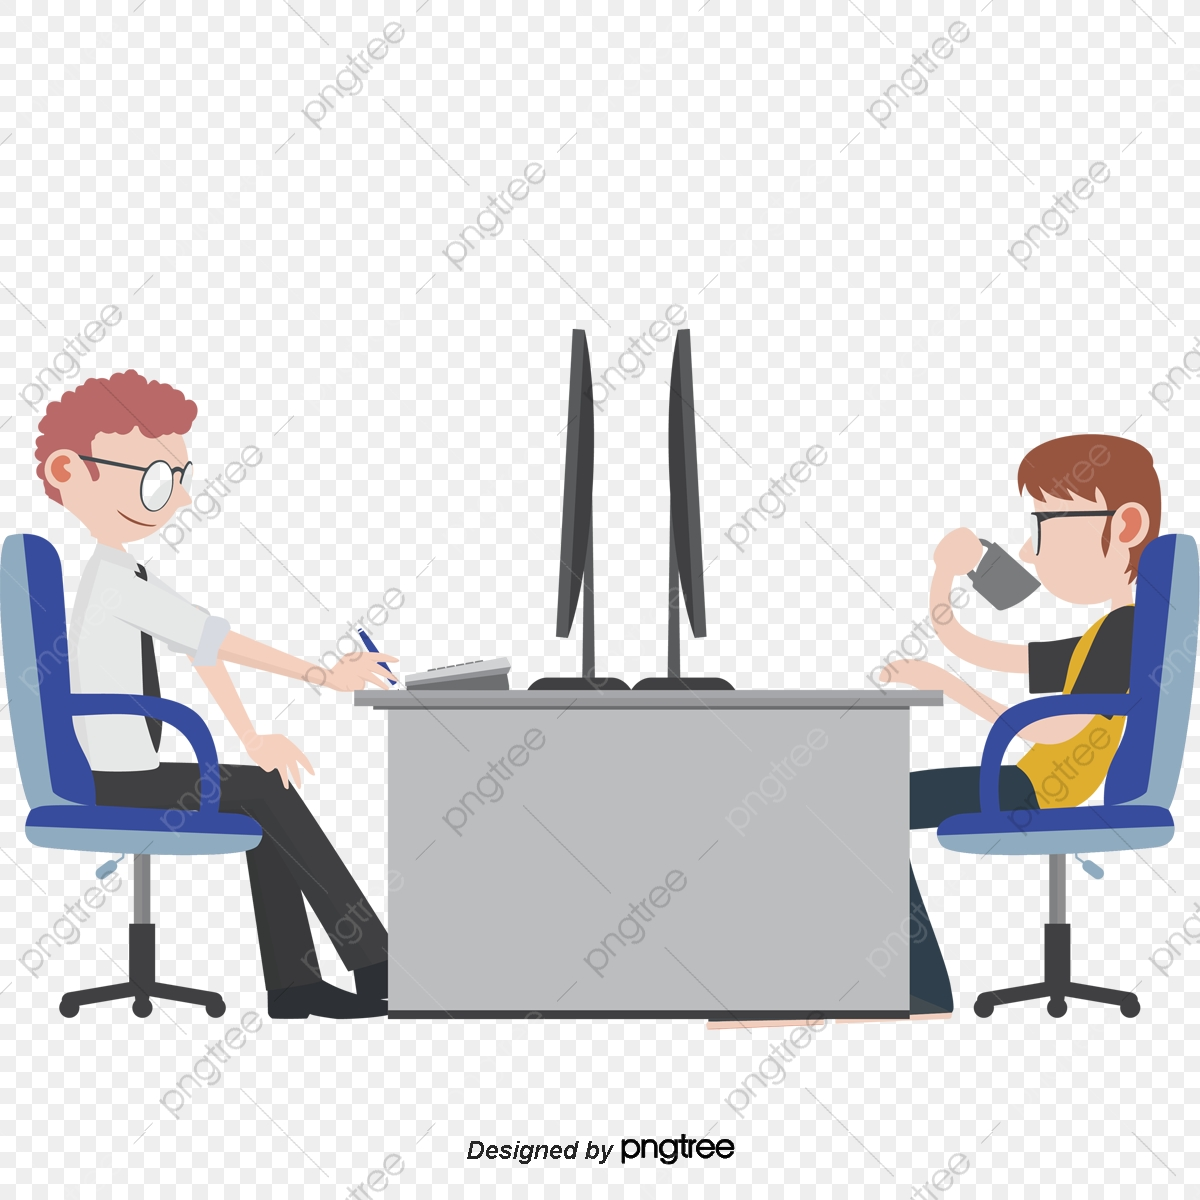 jpg free download Vector business negotiation. Dialogue